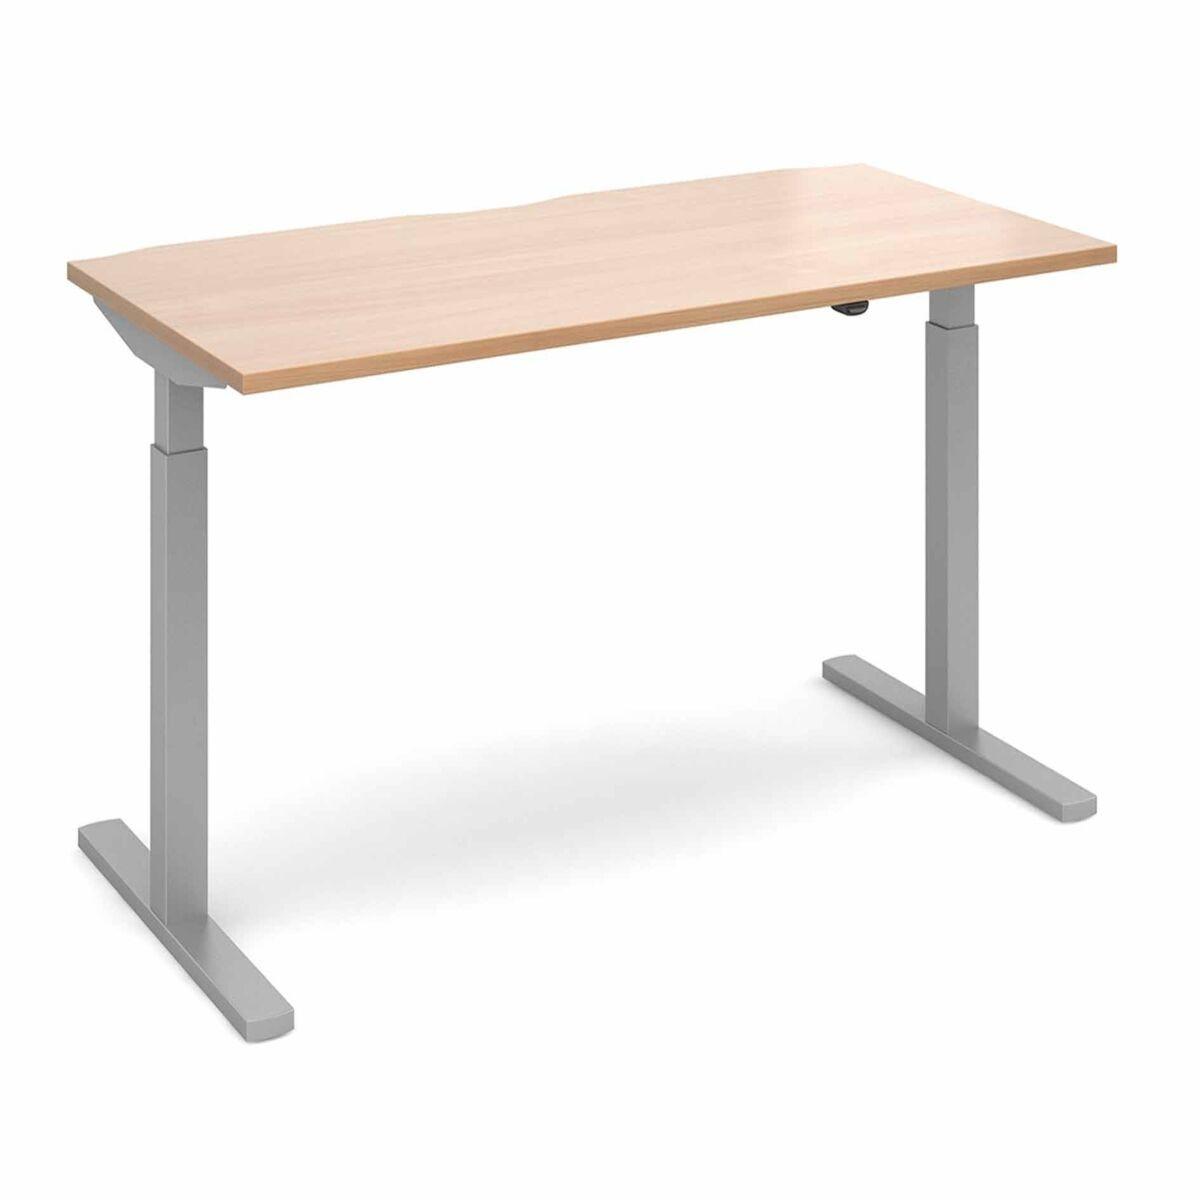 Elev8 Mono Straight Sit Stand Desk 1600mm x 800mm